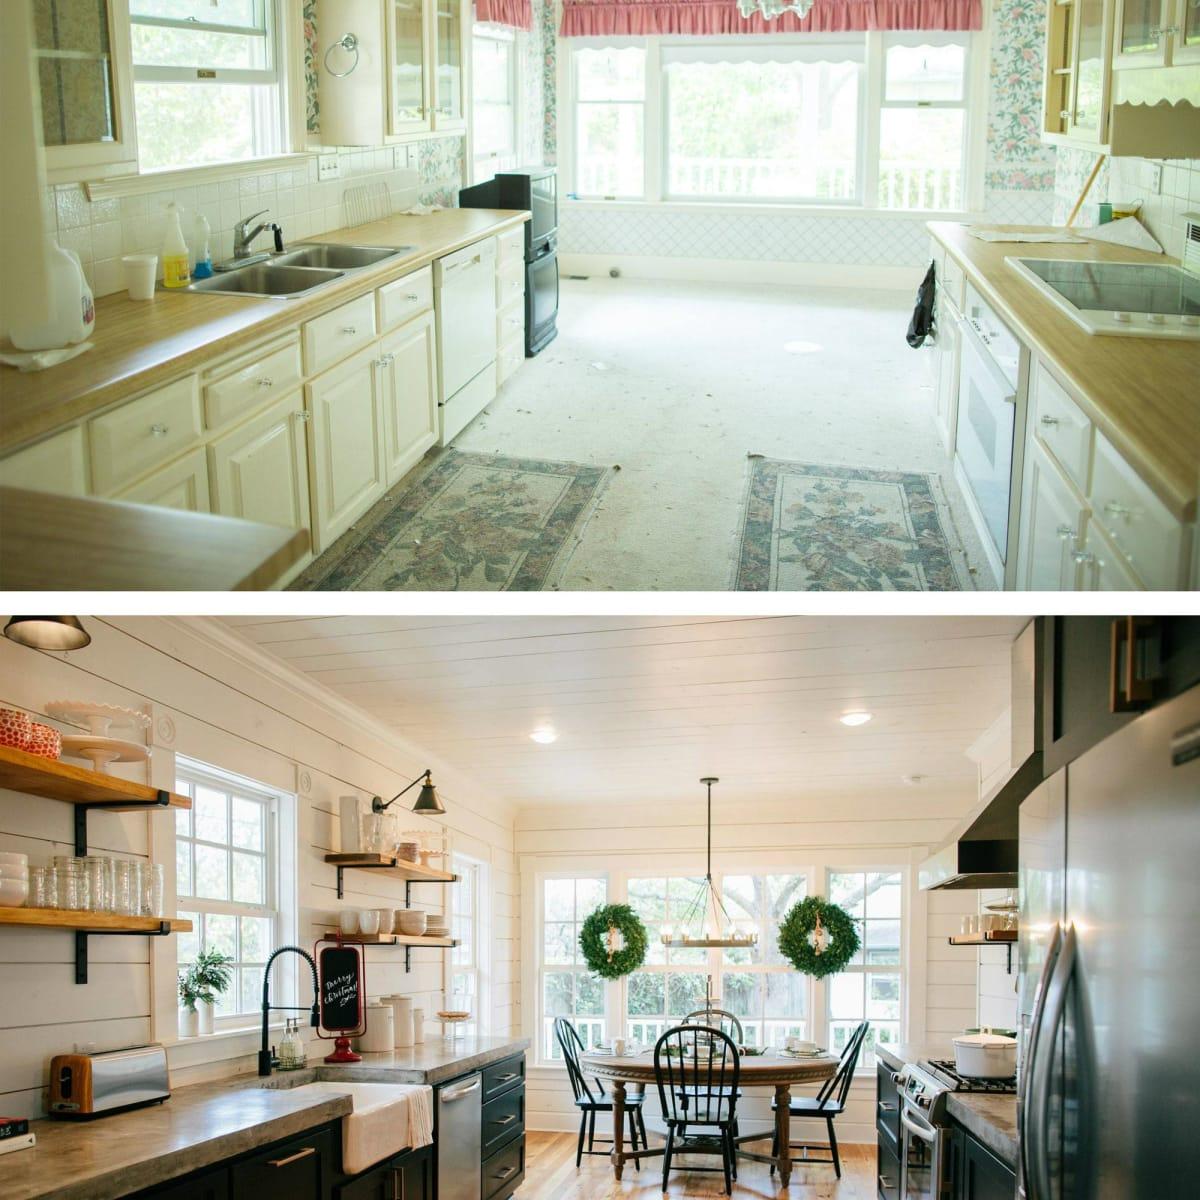 Magnolia House kitchen